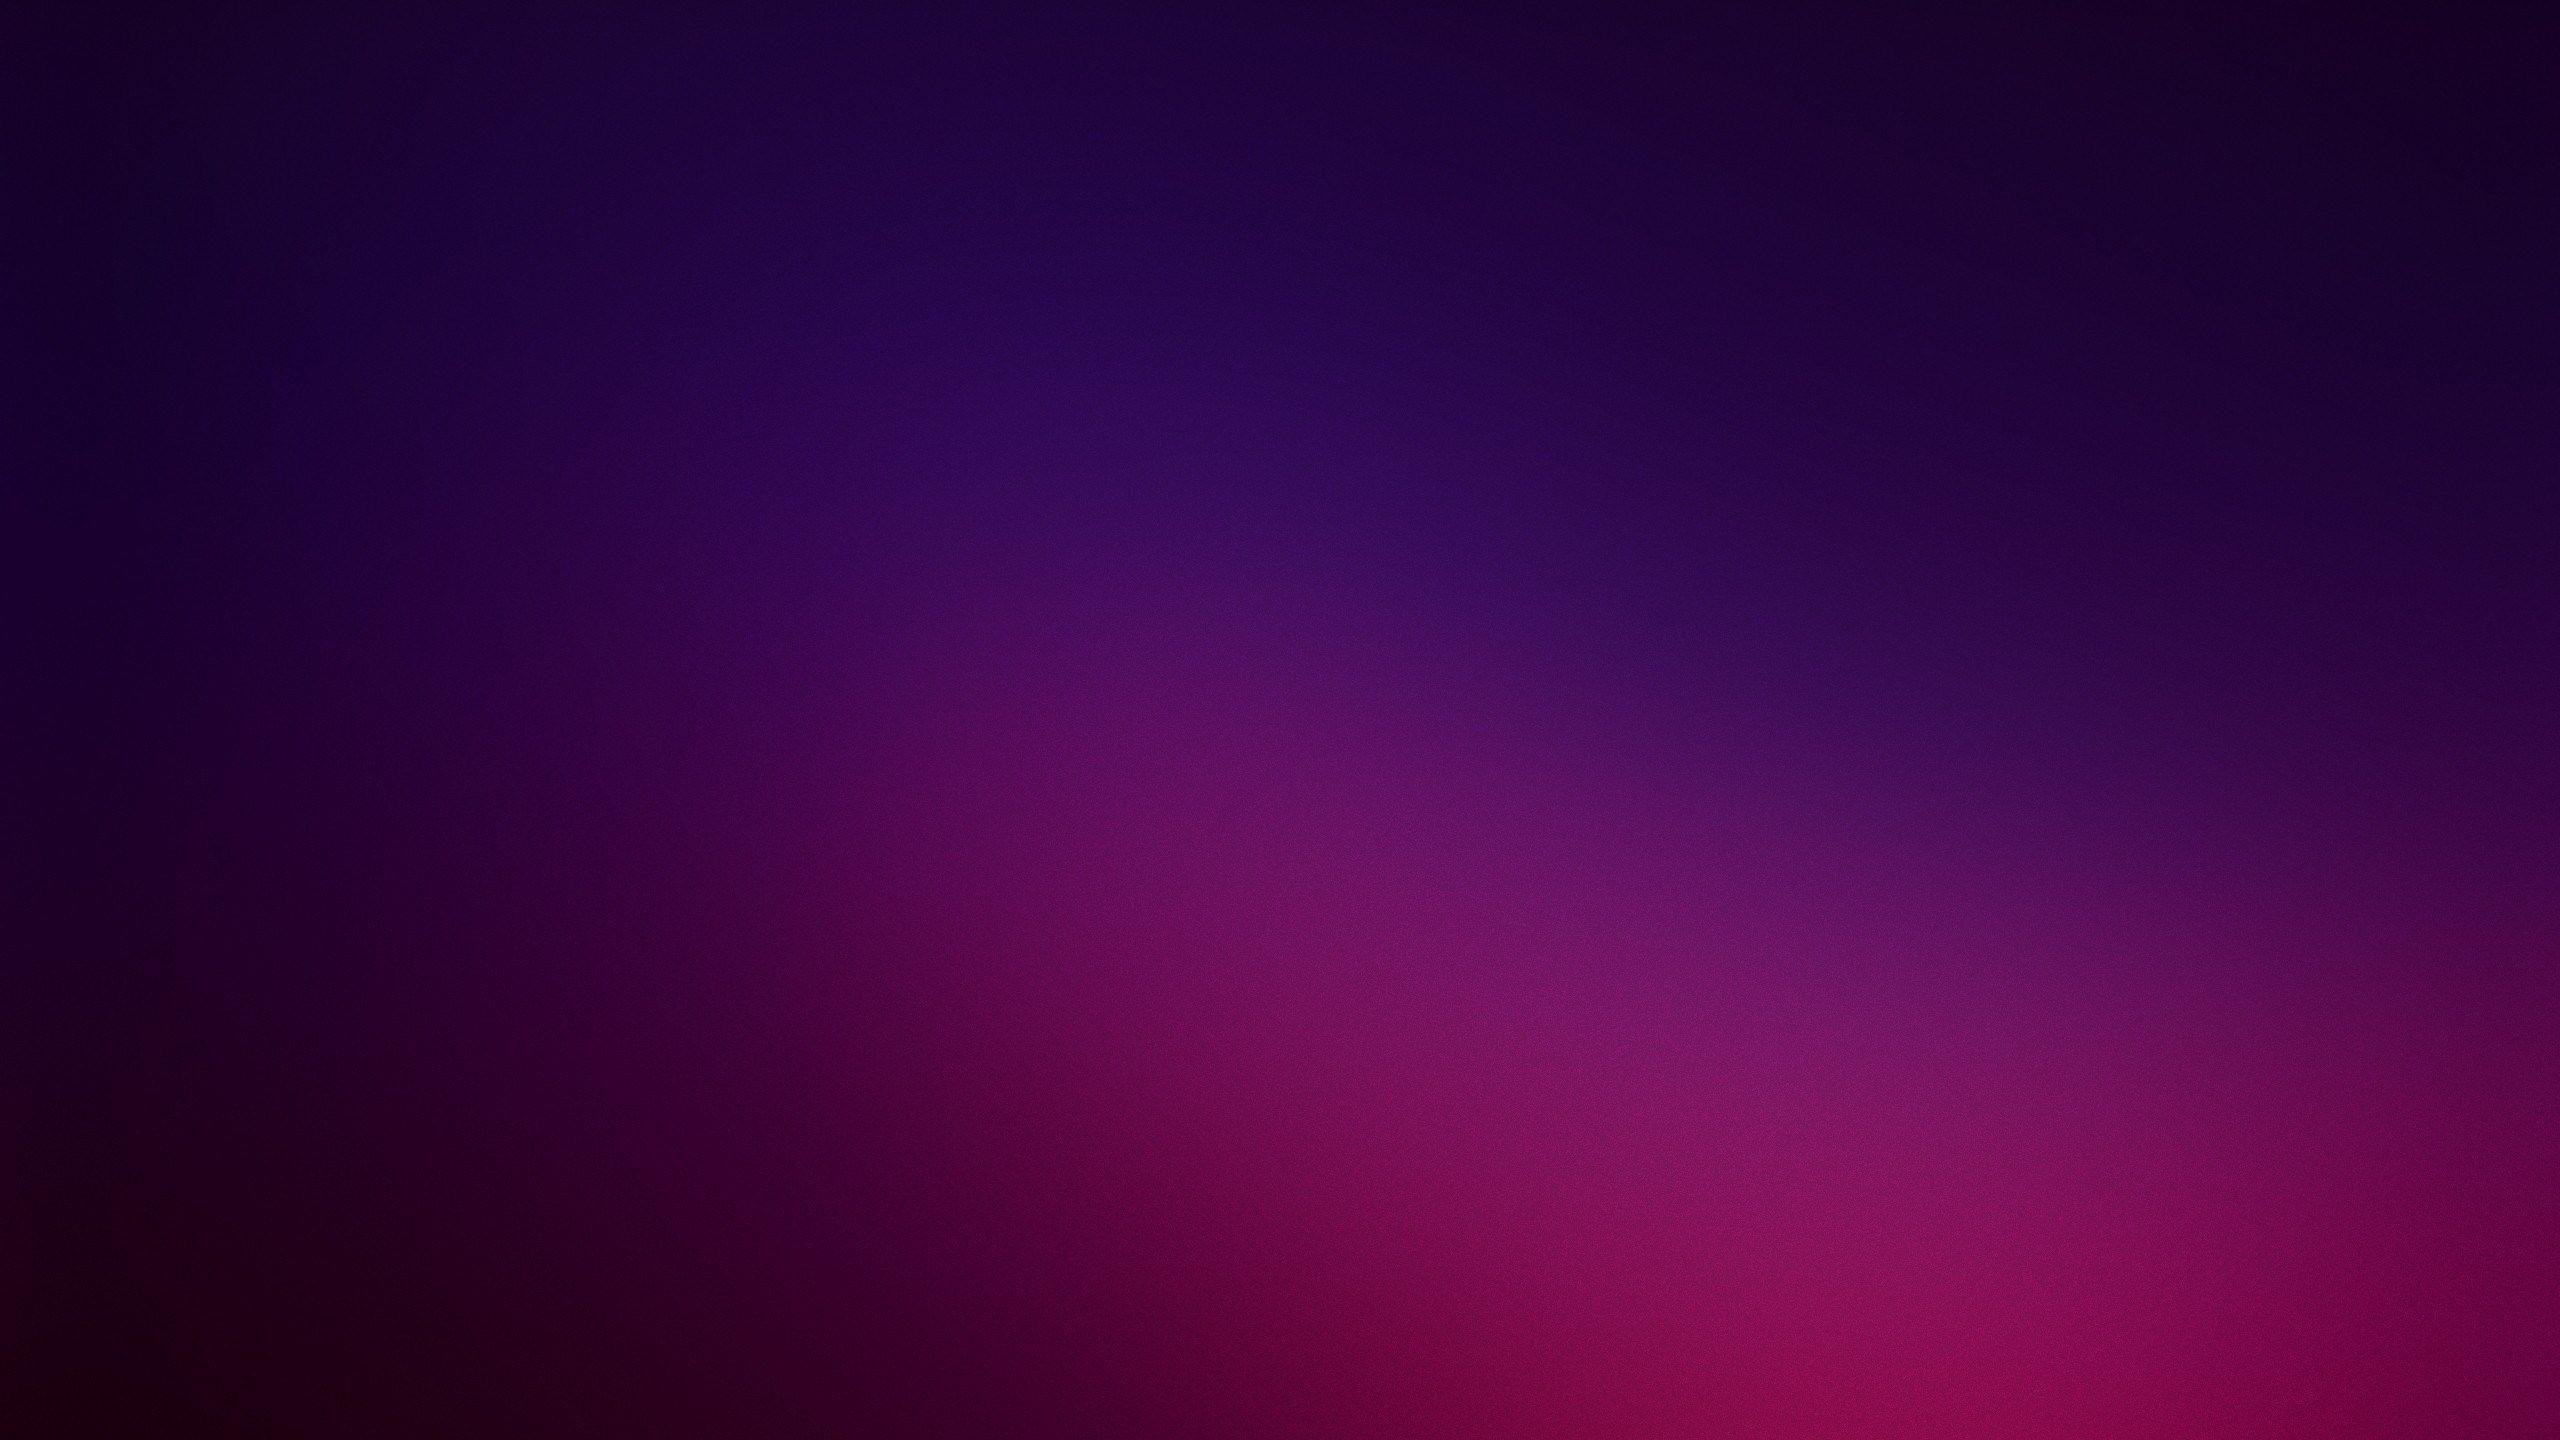 Fantastic Wallpaper High Quality Purple - b63de5ced1be7993532fb816c62651db  Pictures_906418.jpg